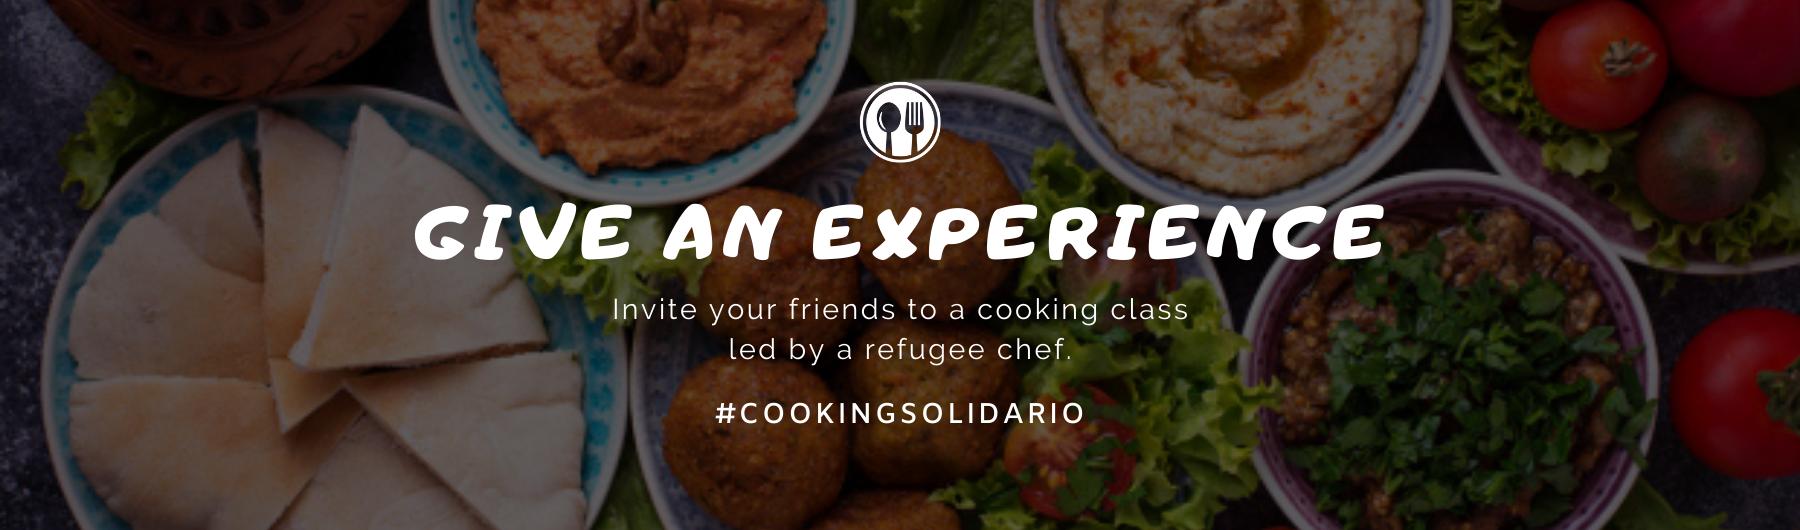 MFR Gift Card Cooking Solidario